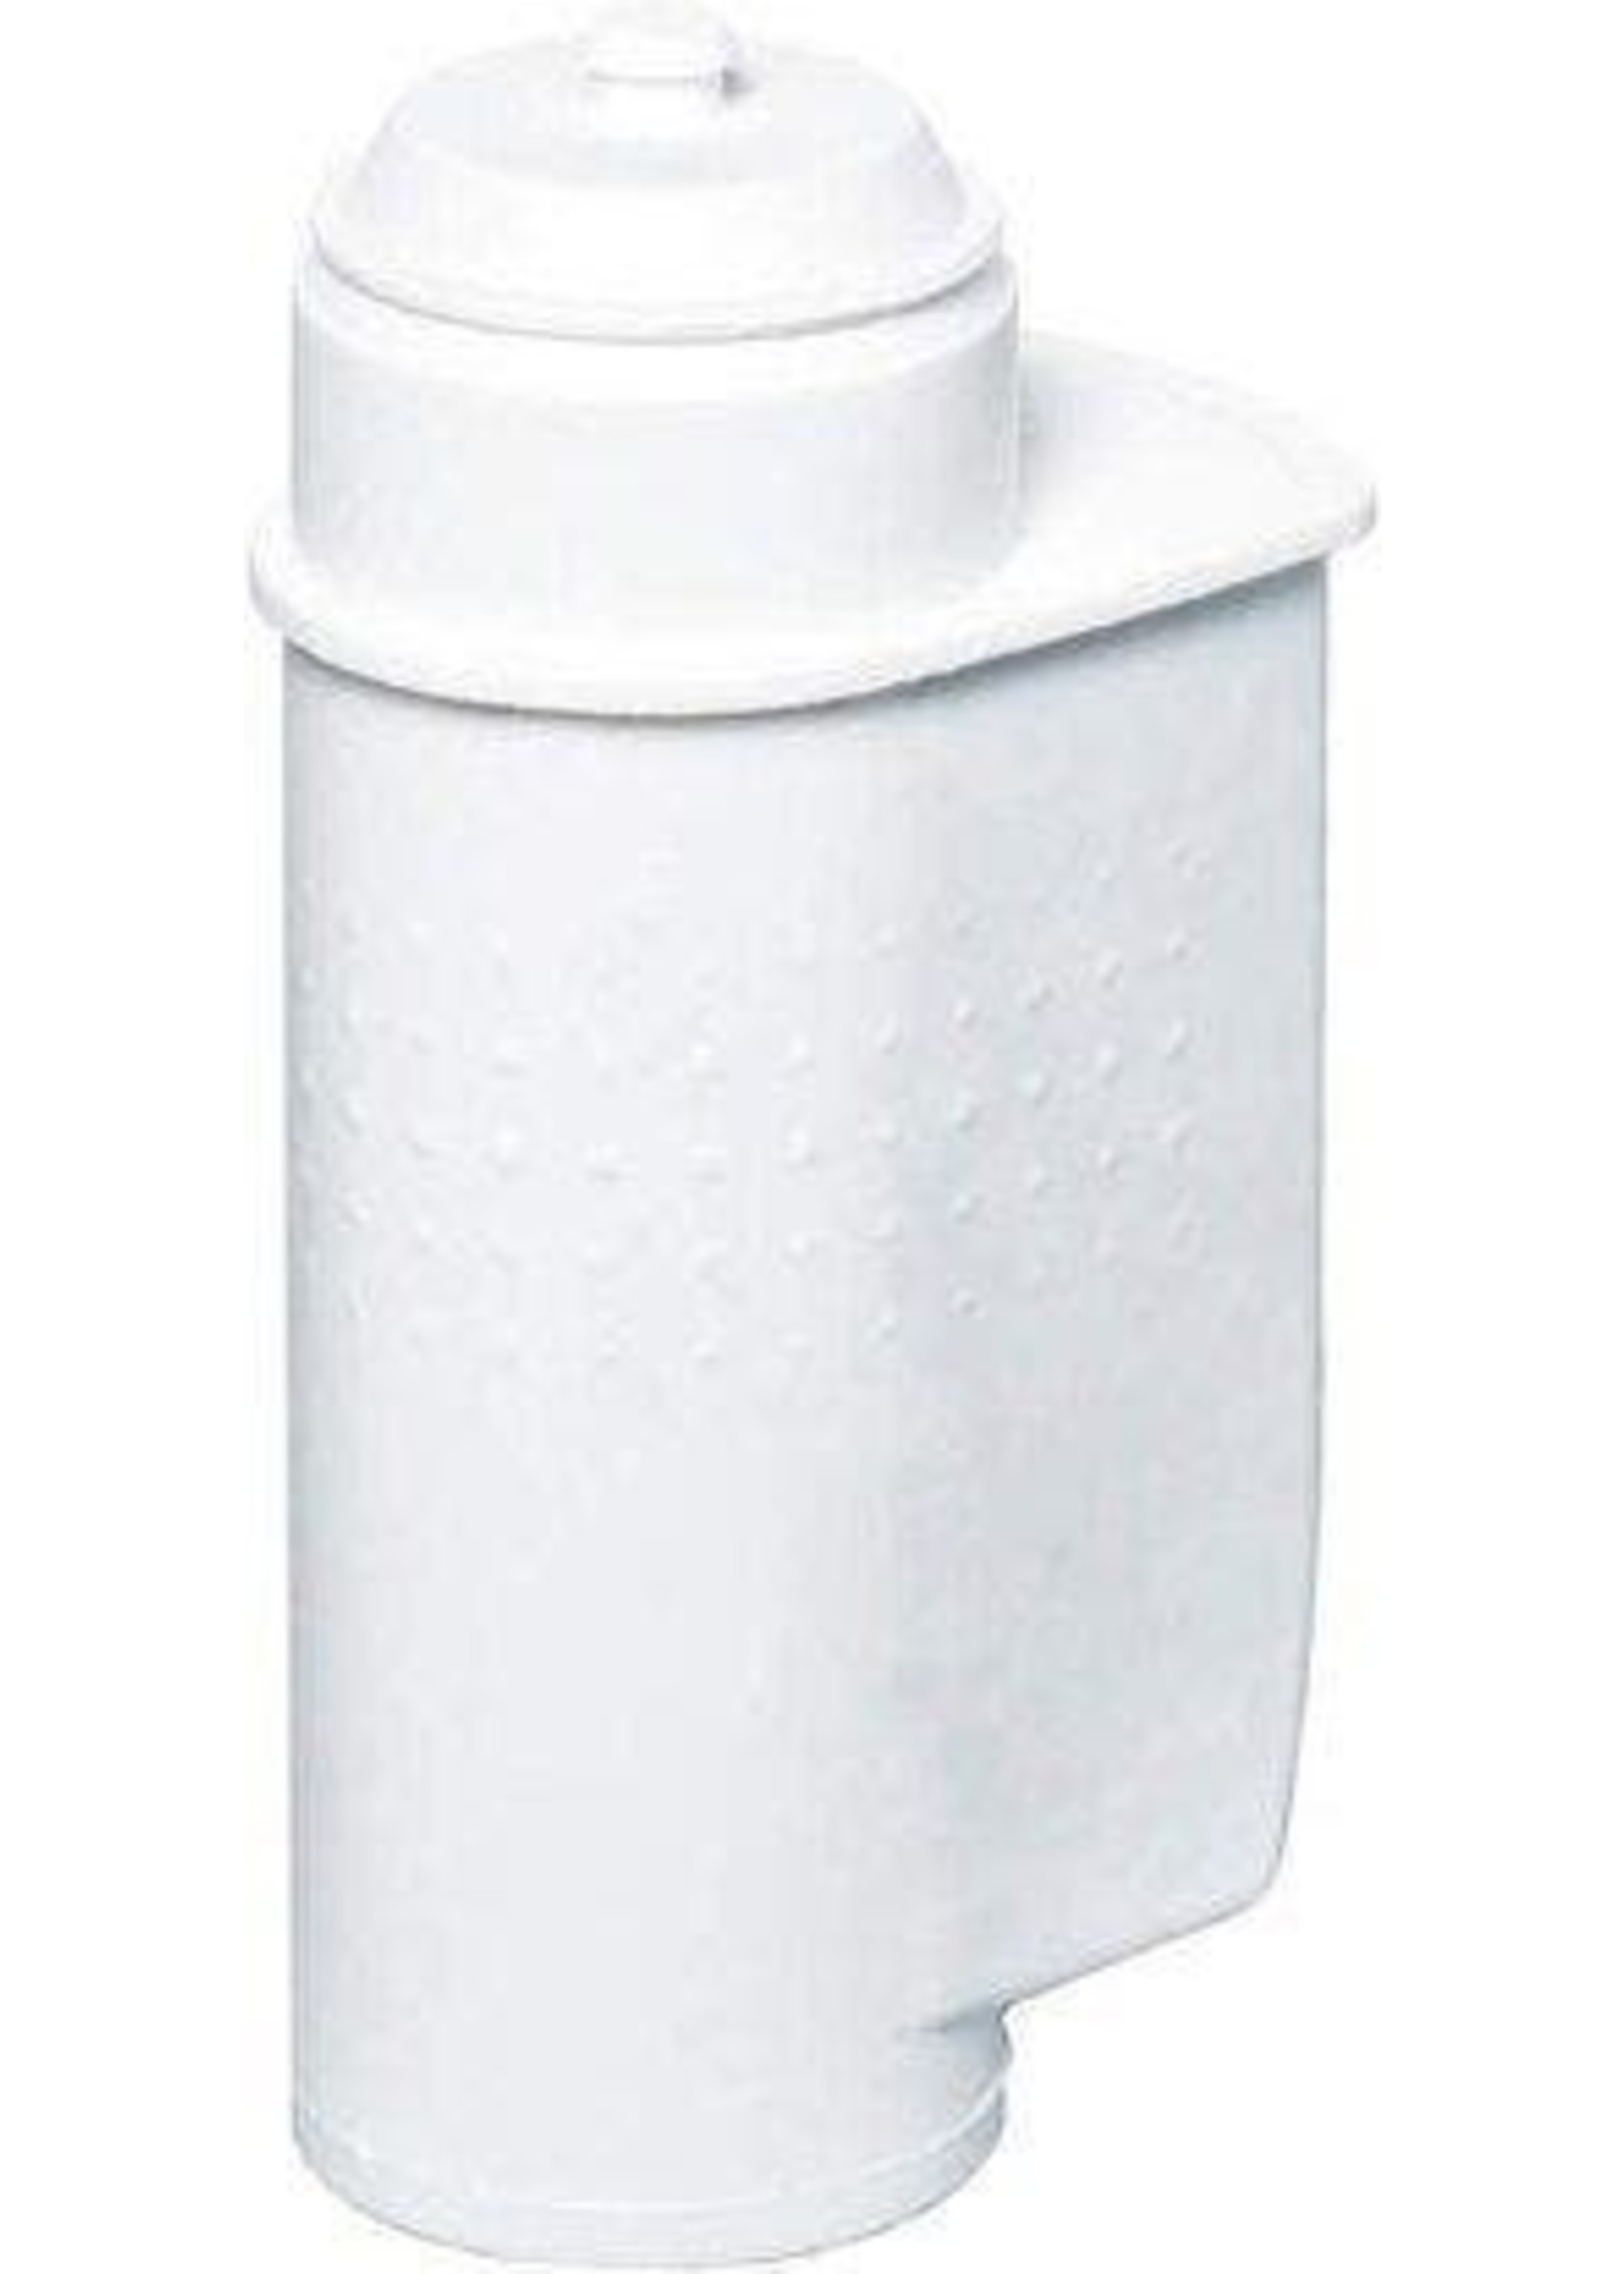 Solis Solis waterfilter 1 stuk Brita Intenza Perfetta Plus 1170